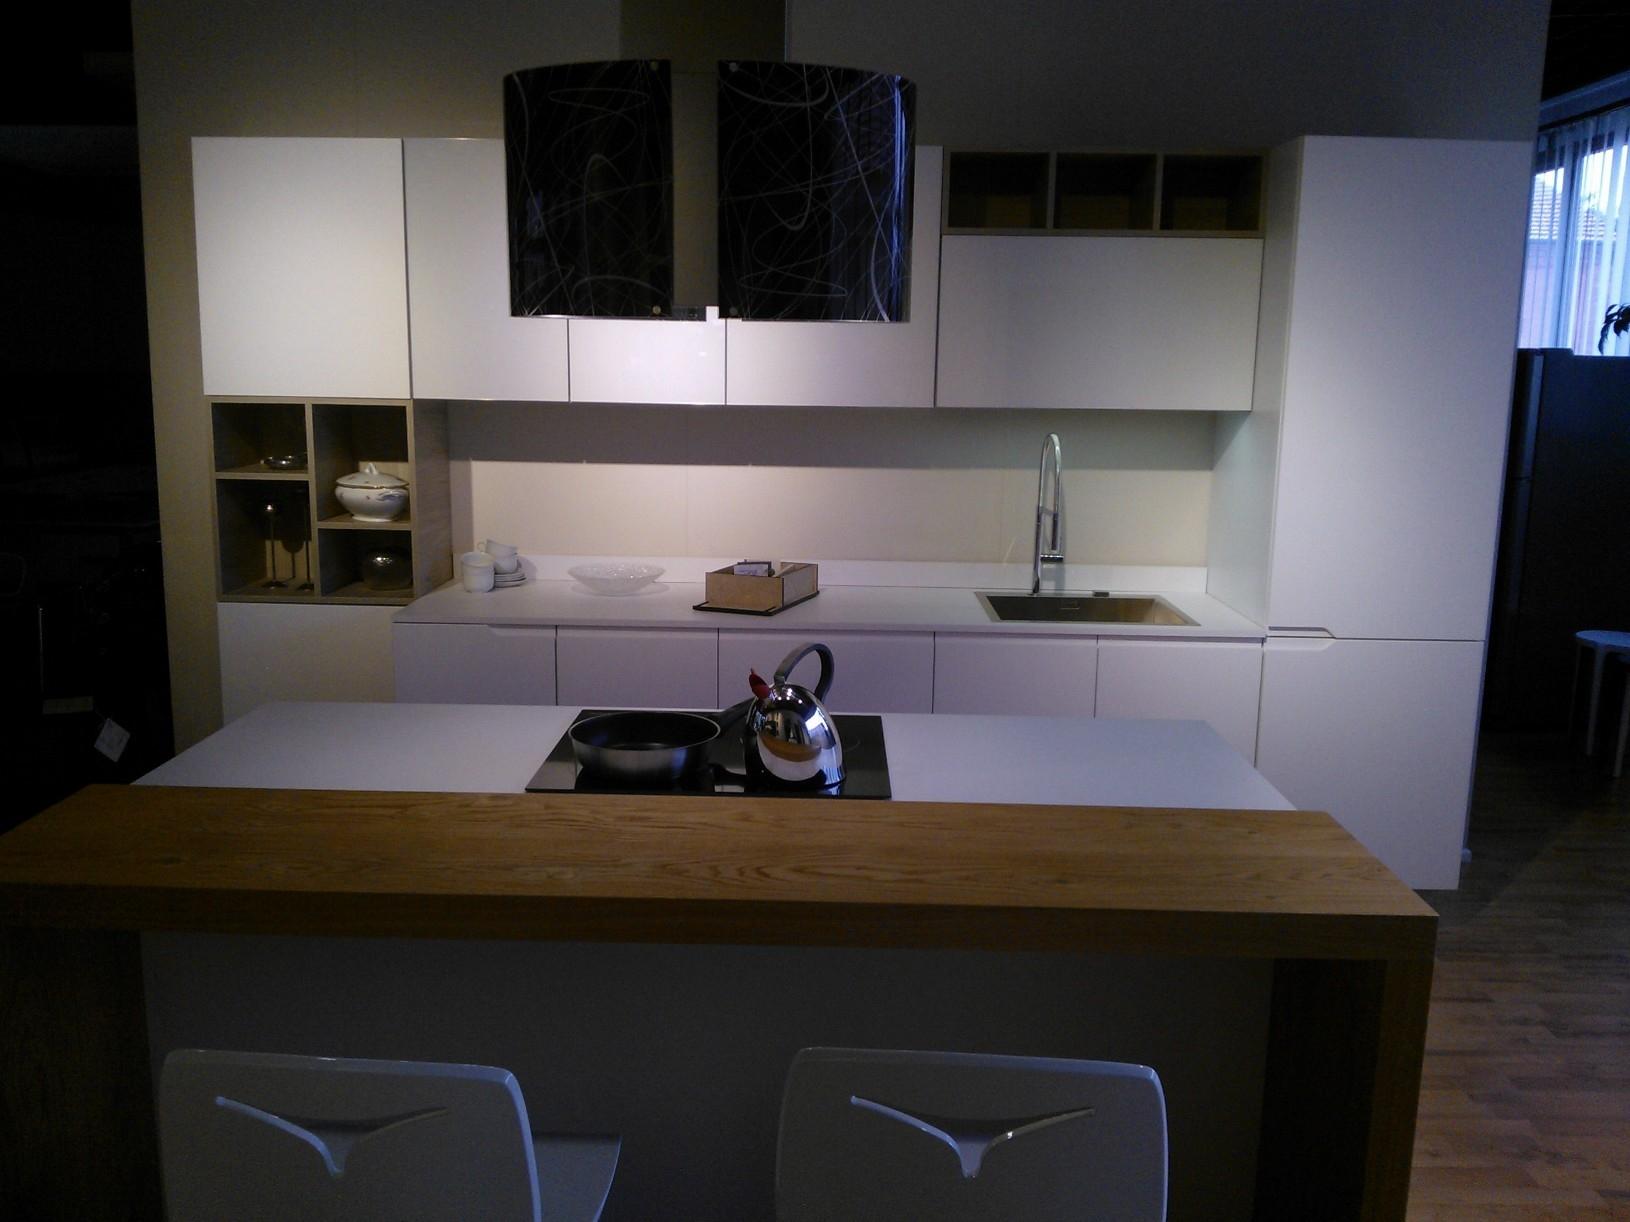 Cucina moderna laccato bianco met prezzo cucine a for Cucina moderna 3 60